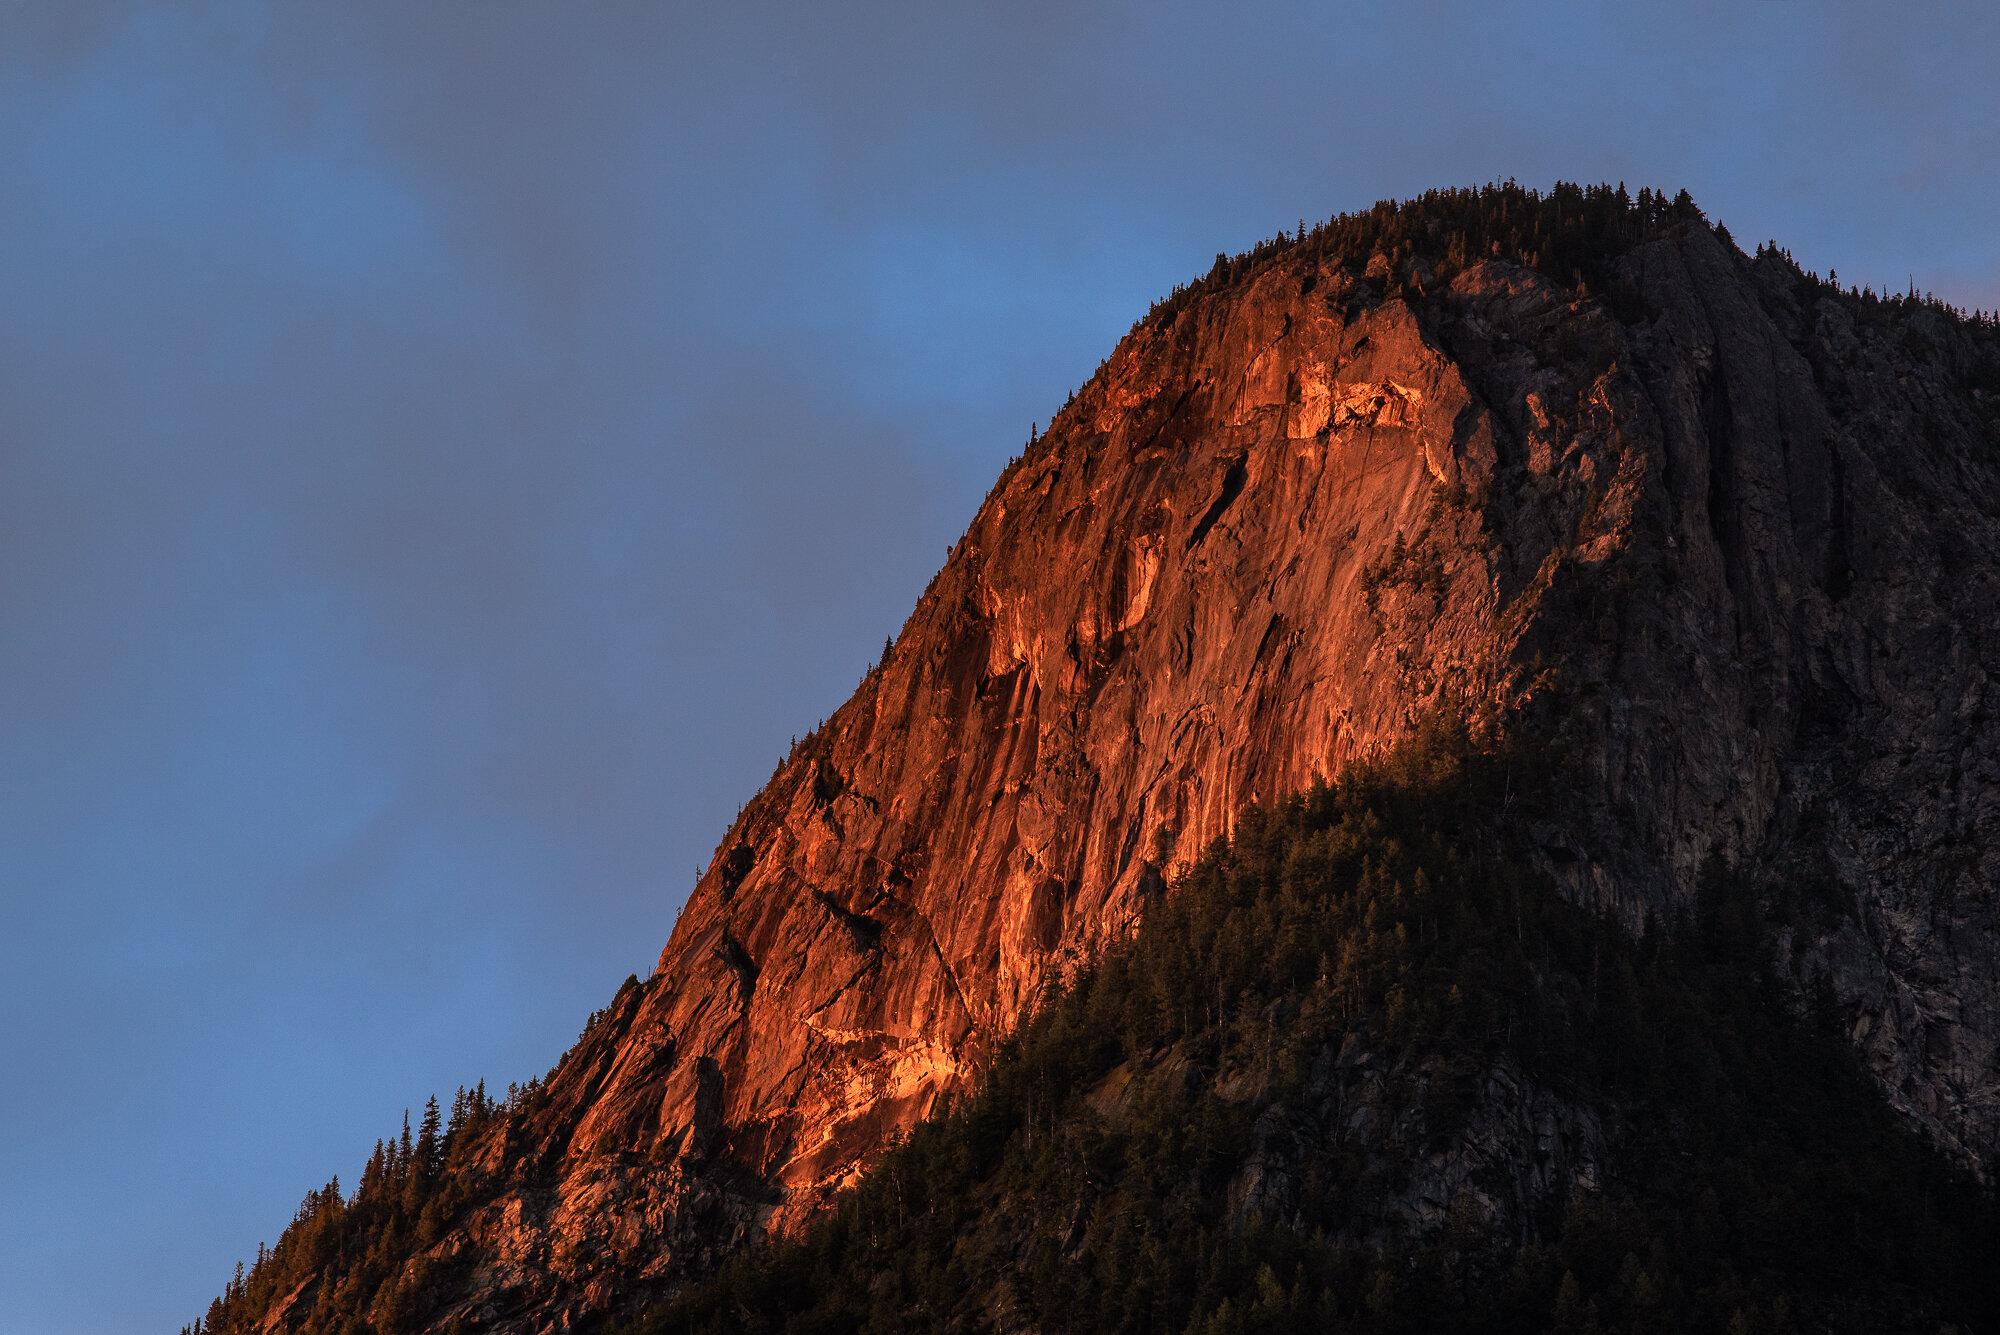 British Columbia Mountains: 'The Last Light'